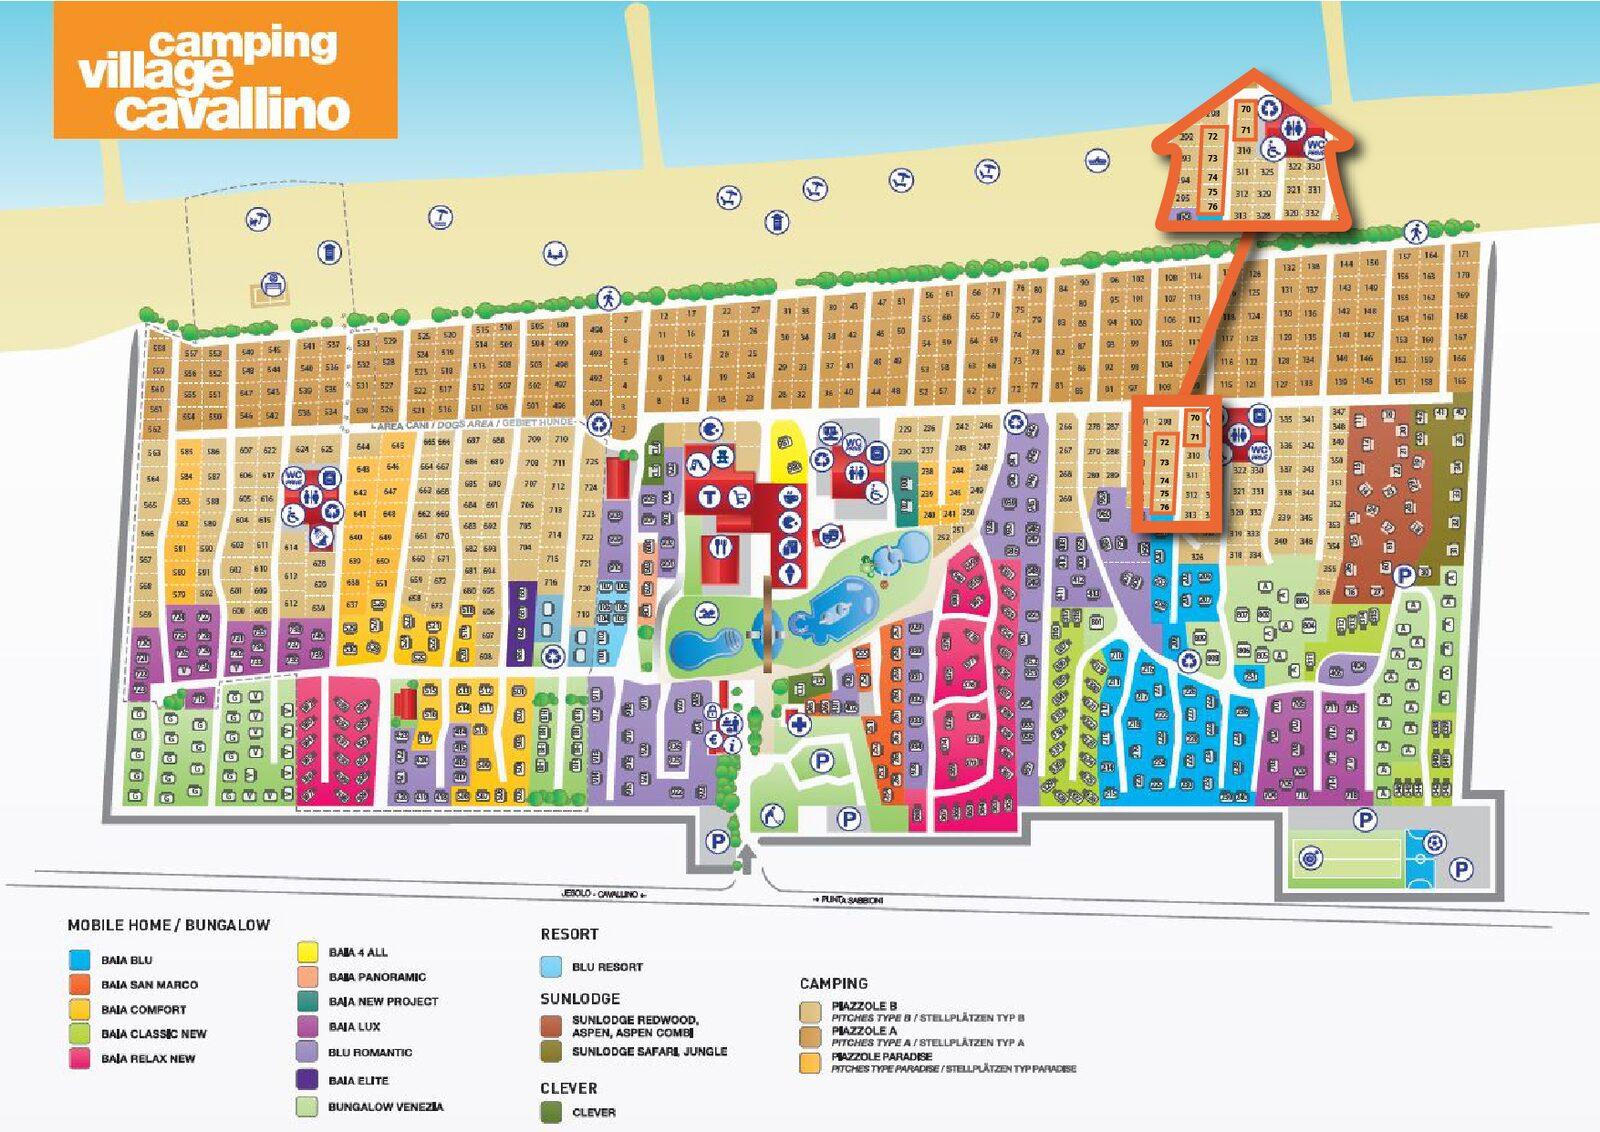 Map of Camping Village Cavallino